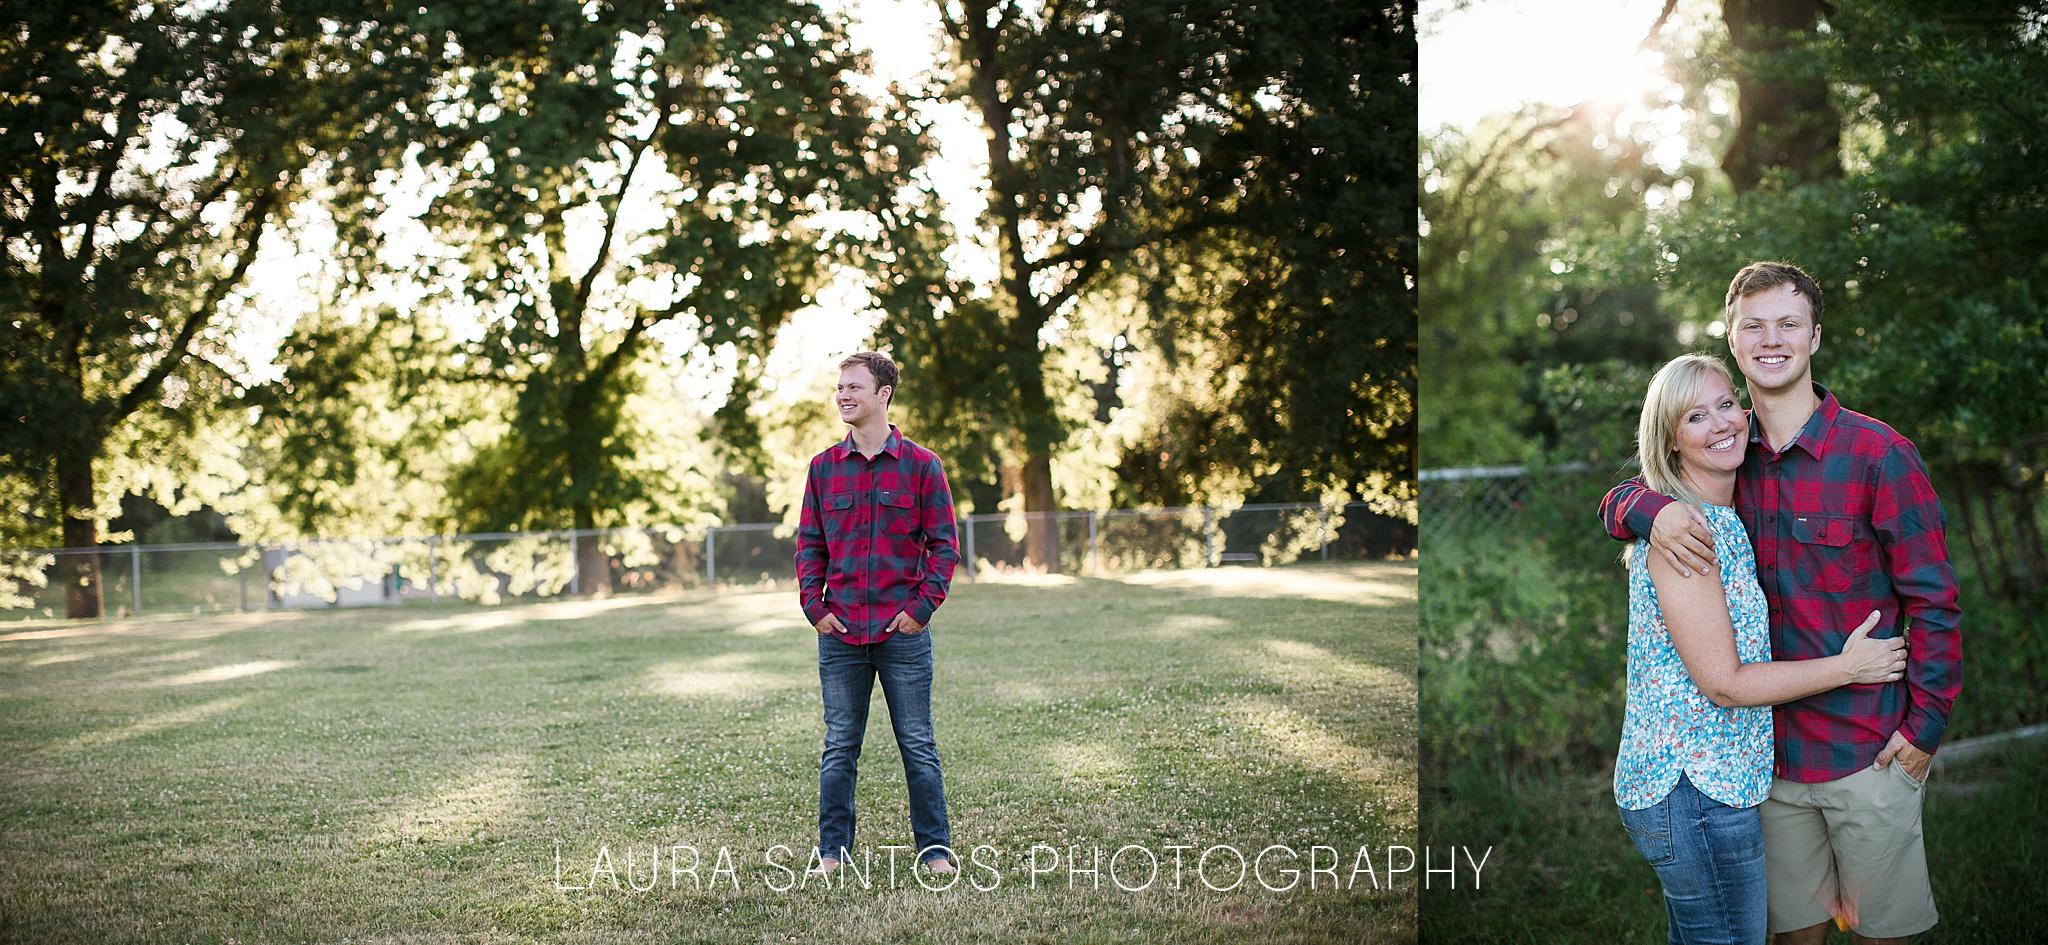 Laura Santos Photography Portland Oregon Family Photographer_1110.jpg